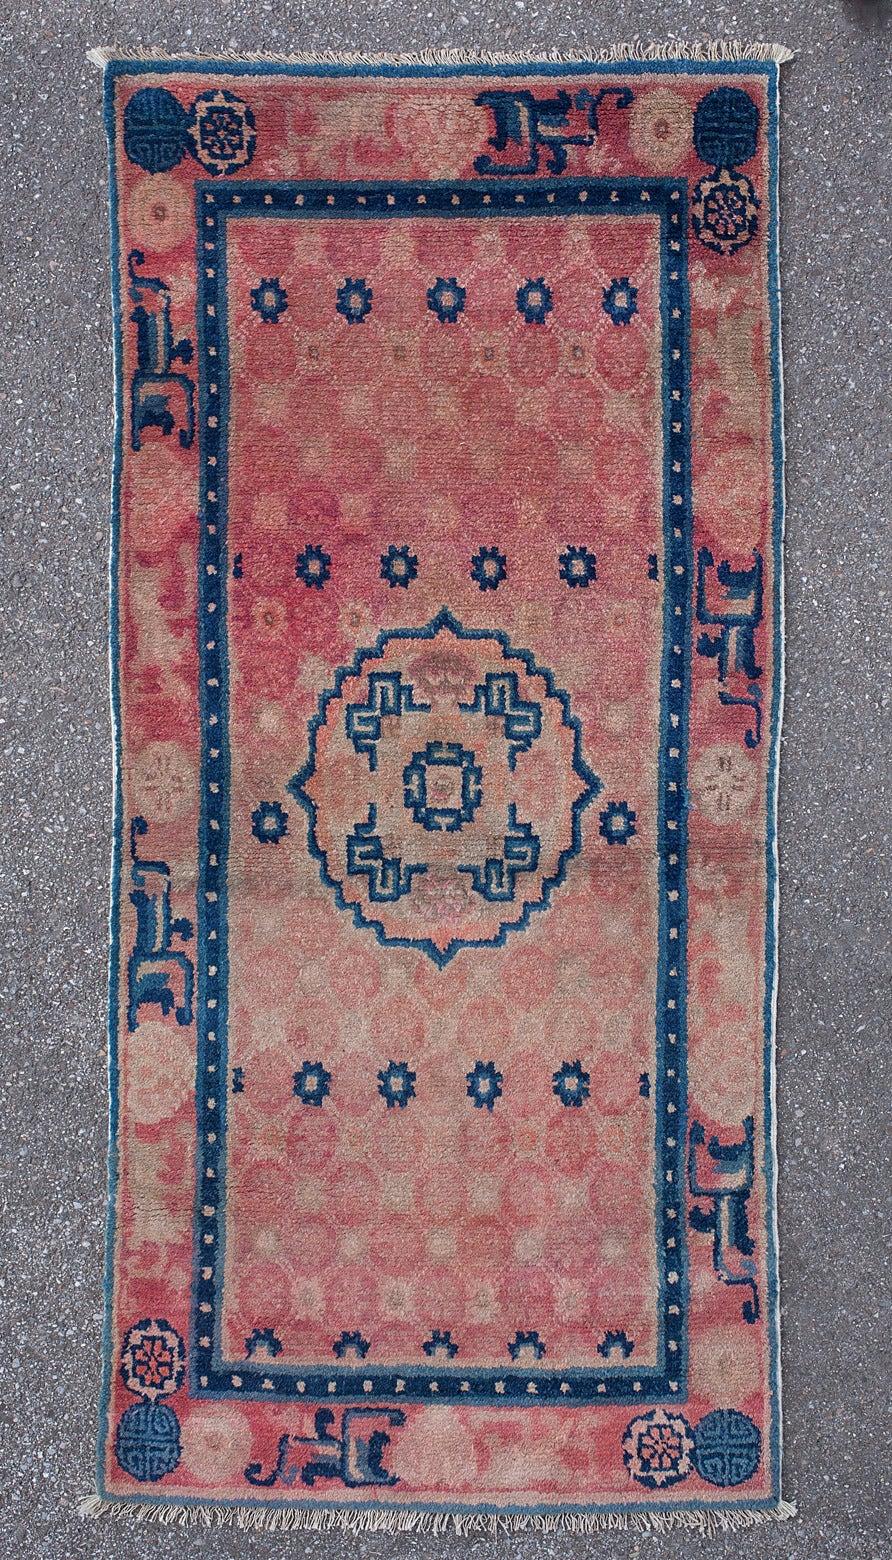 5'6''x8' Far East Blue Rug Mongolian Colorful | Etsy |Mongol Rug